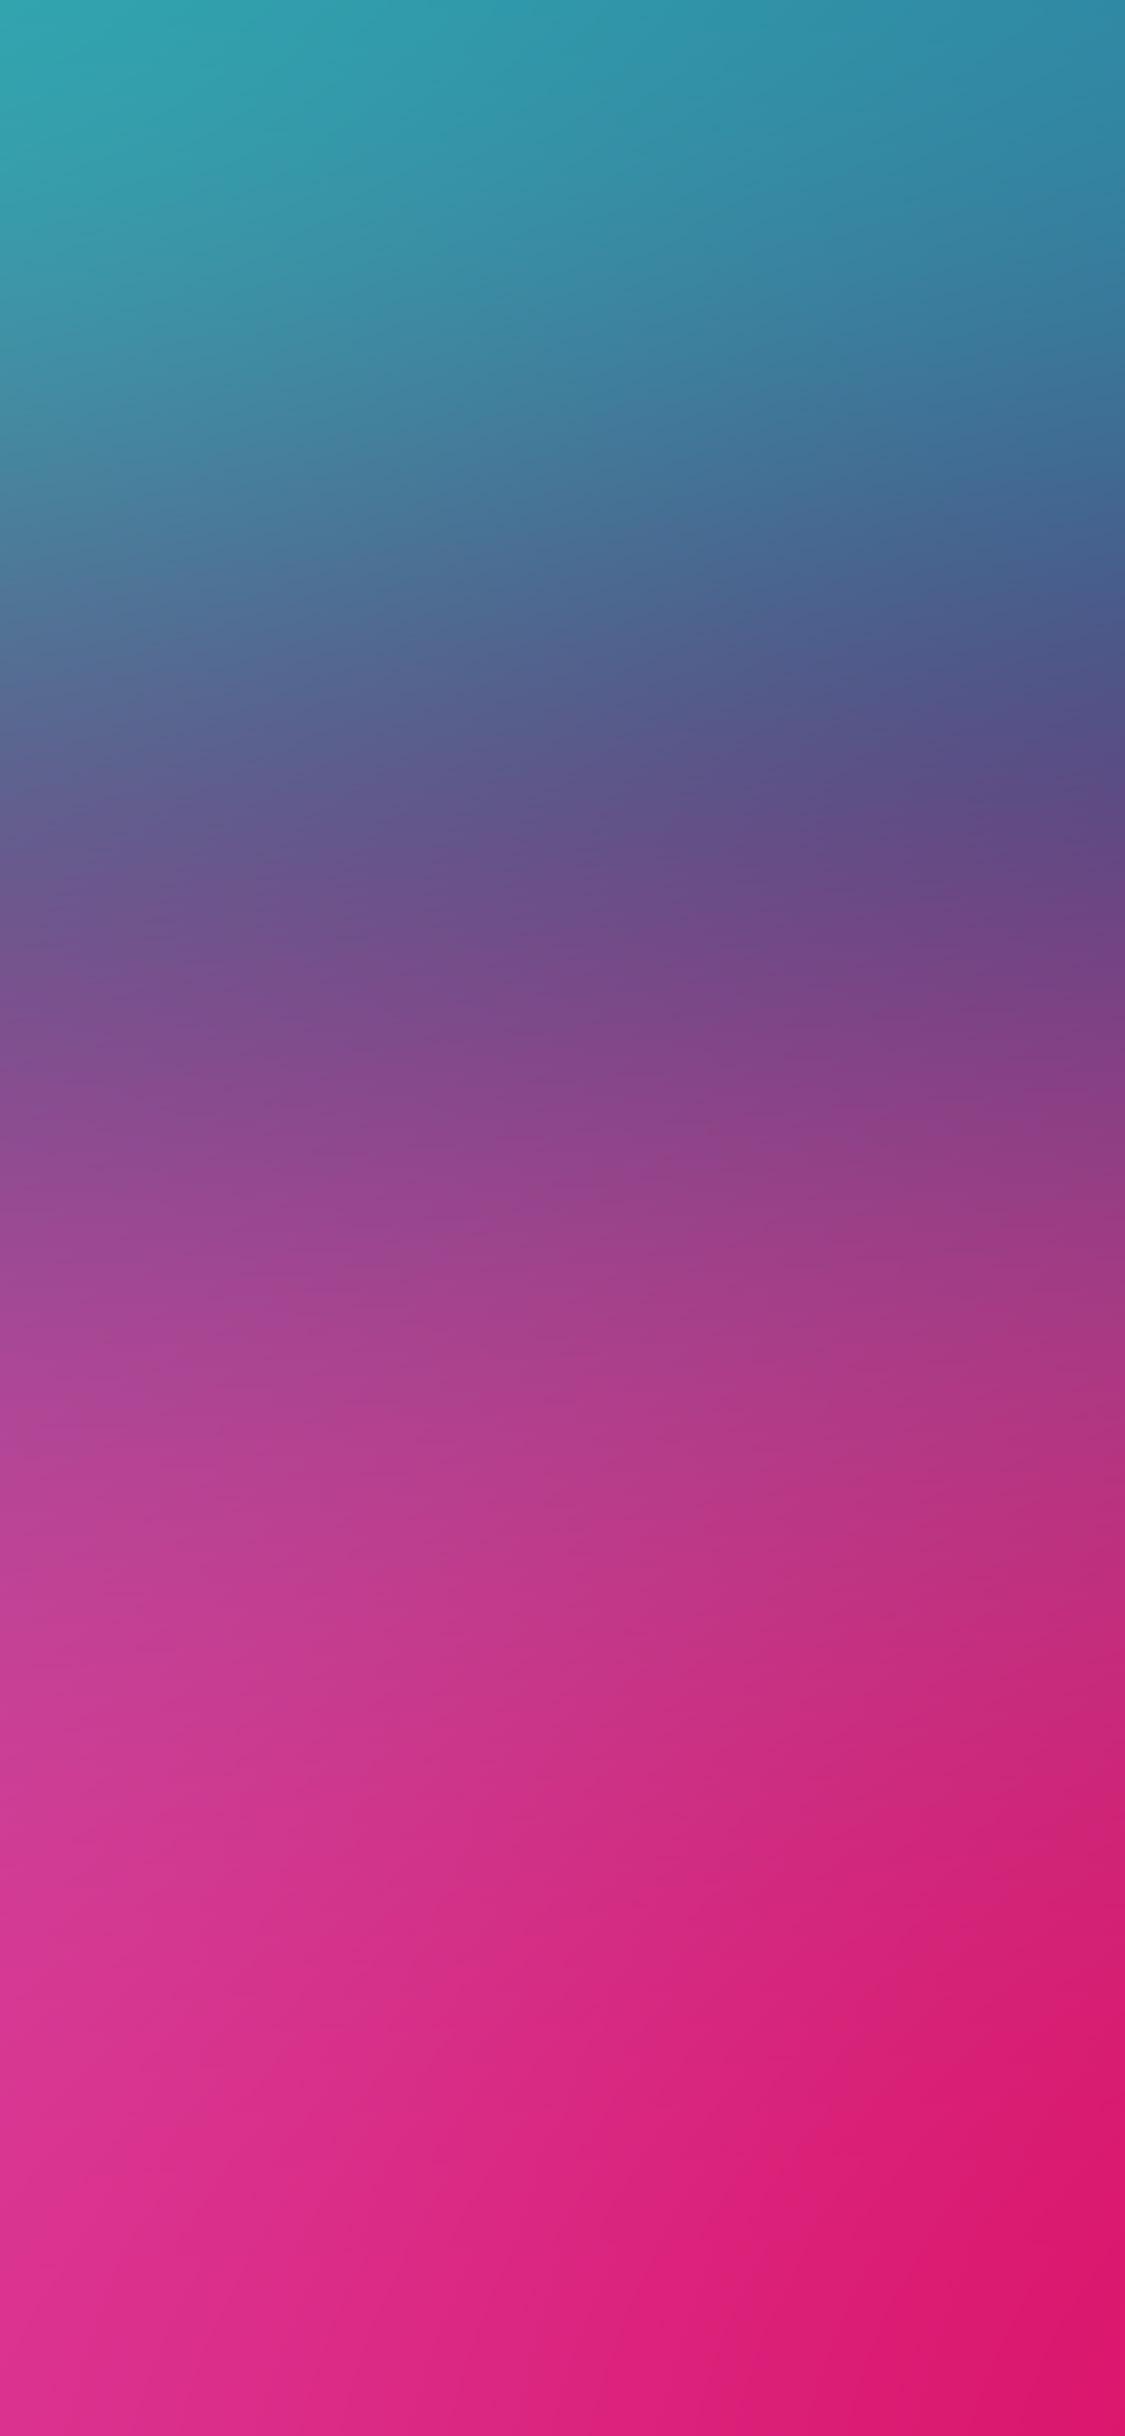 iPhonexpapers.com-Apple-iPhone-wallpaper-sn21-red-blue-blur-gradation